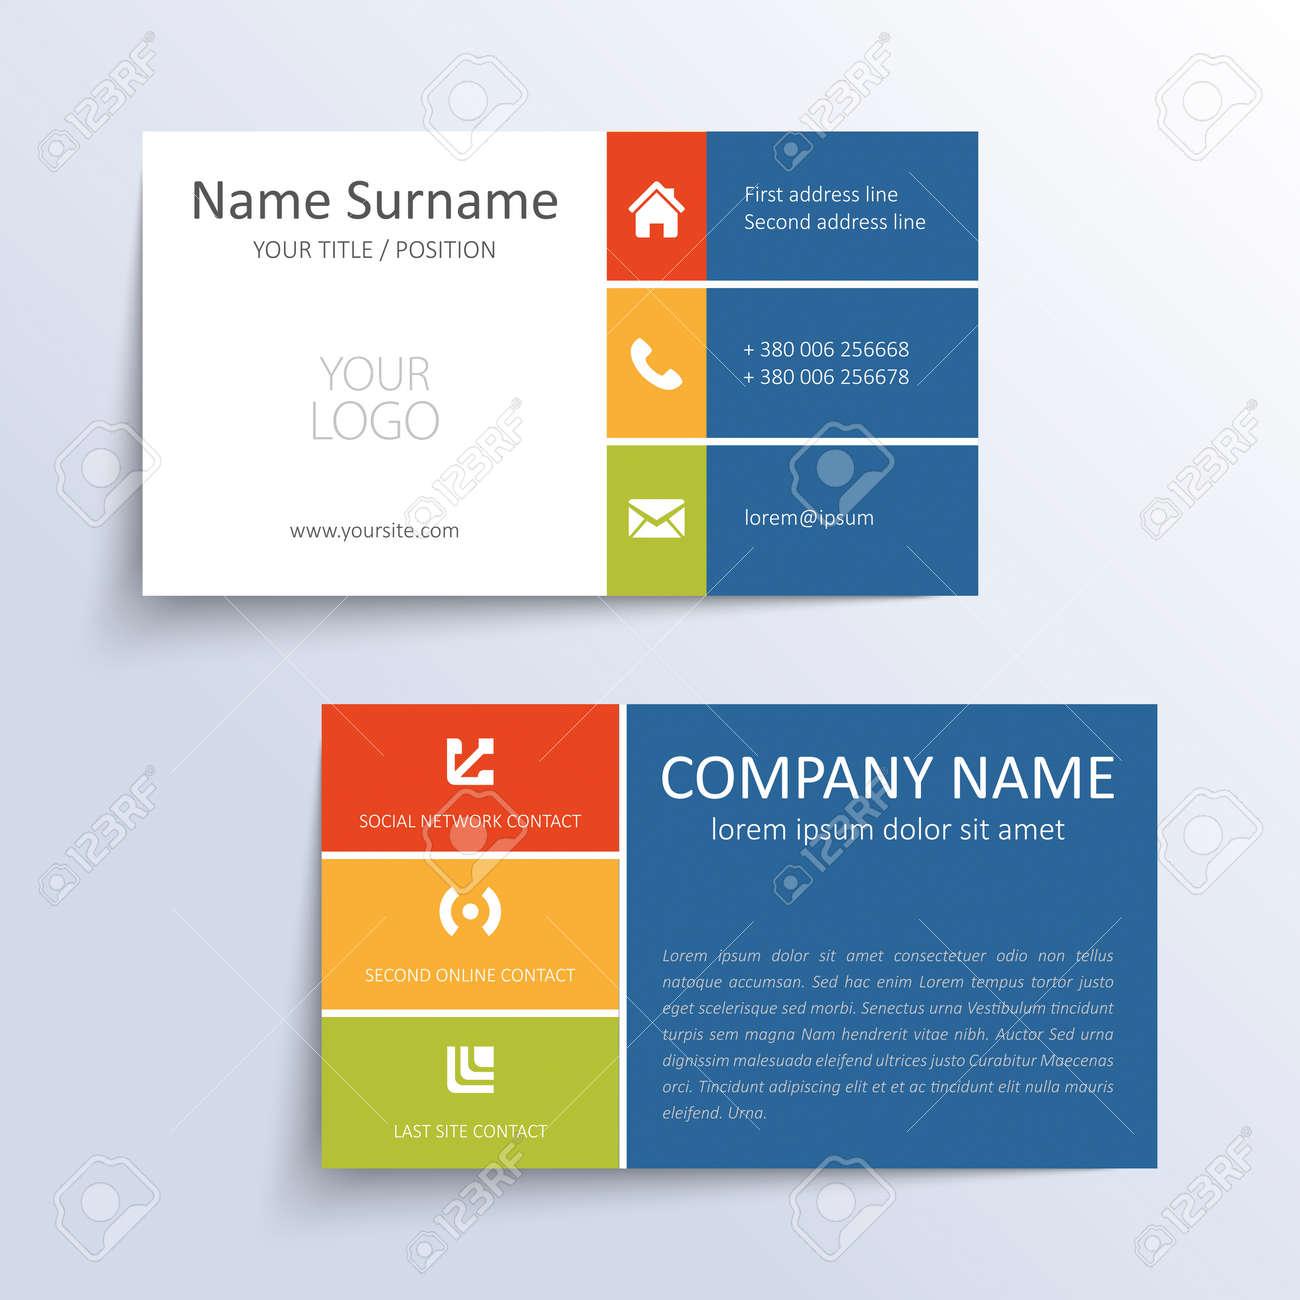 Modern simple business card template royalty free cliparts vectors modern simple business card template stock vector 27665041 colourmoves